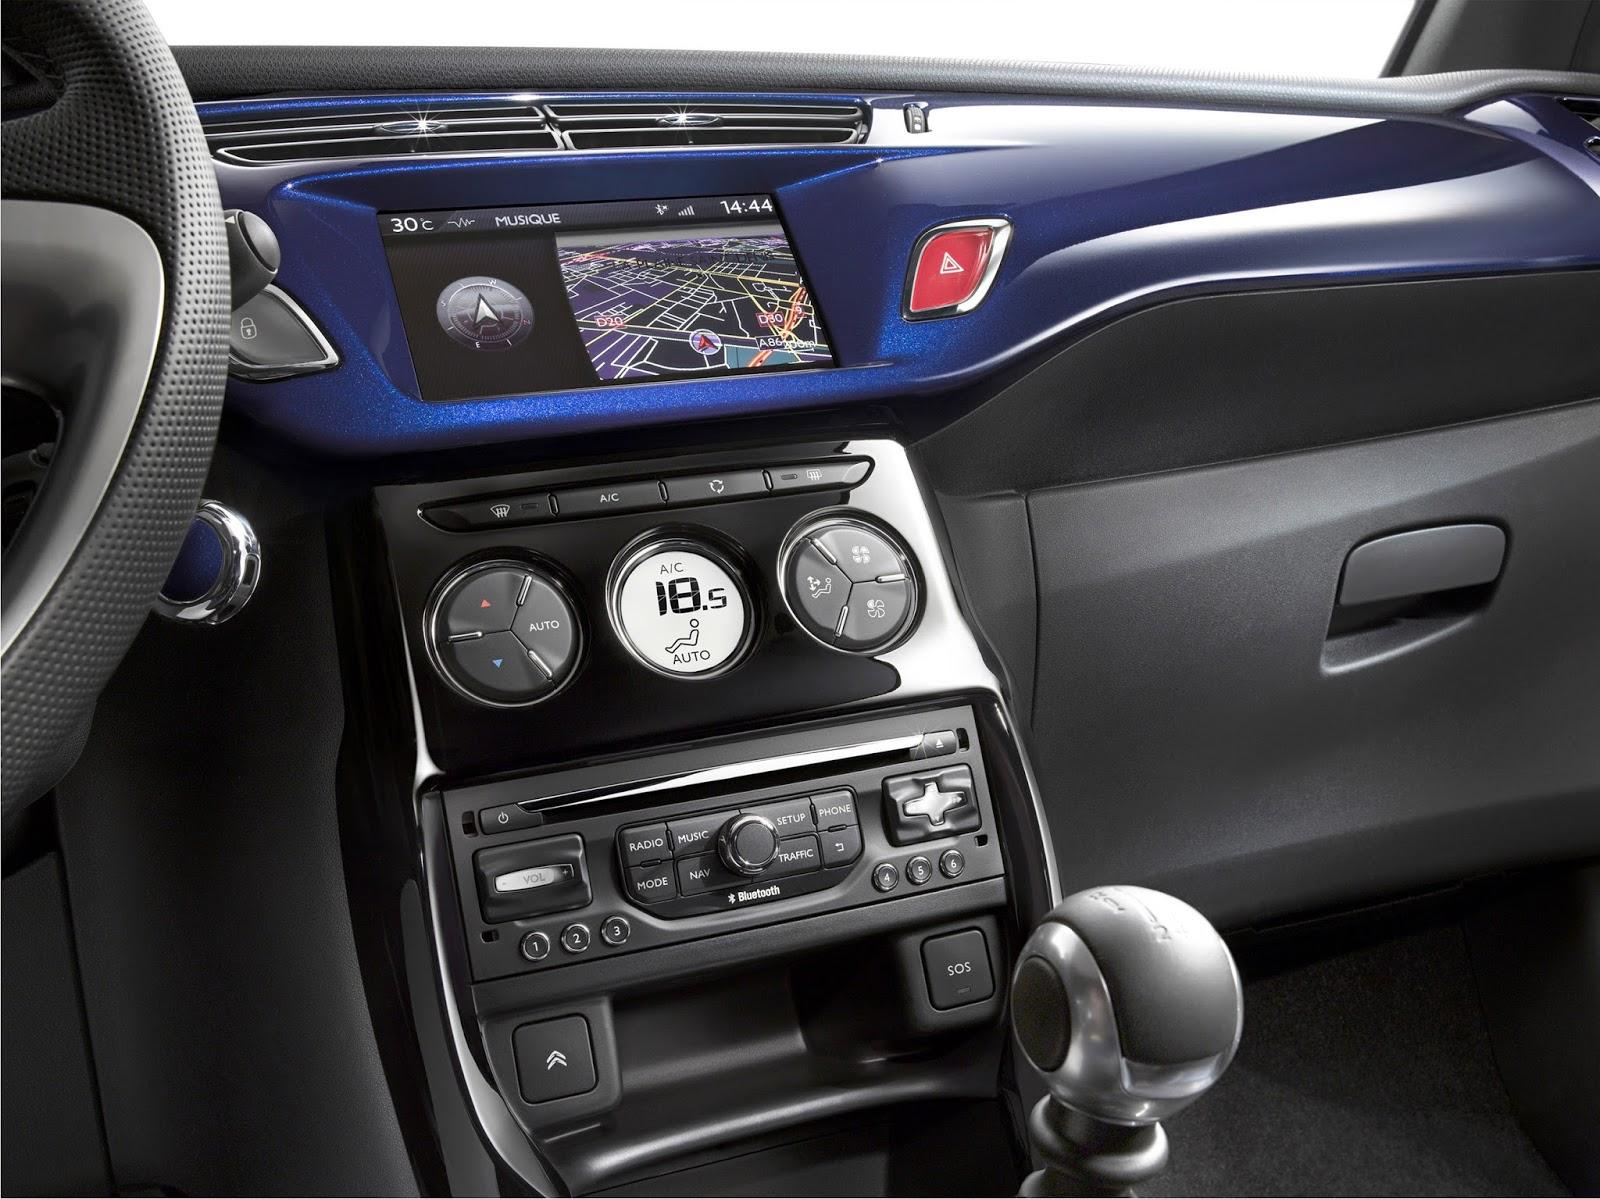 novo Citroën DS3 2014 interior